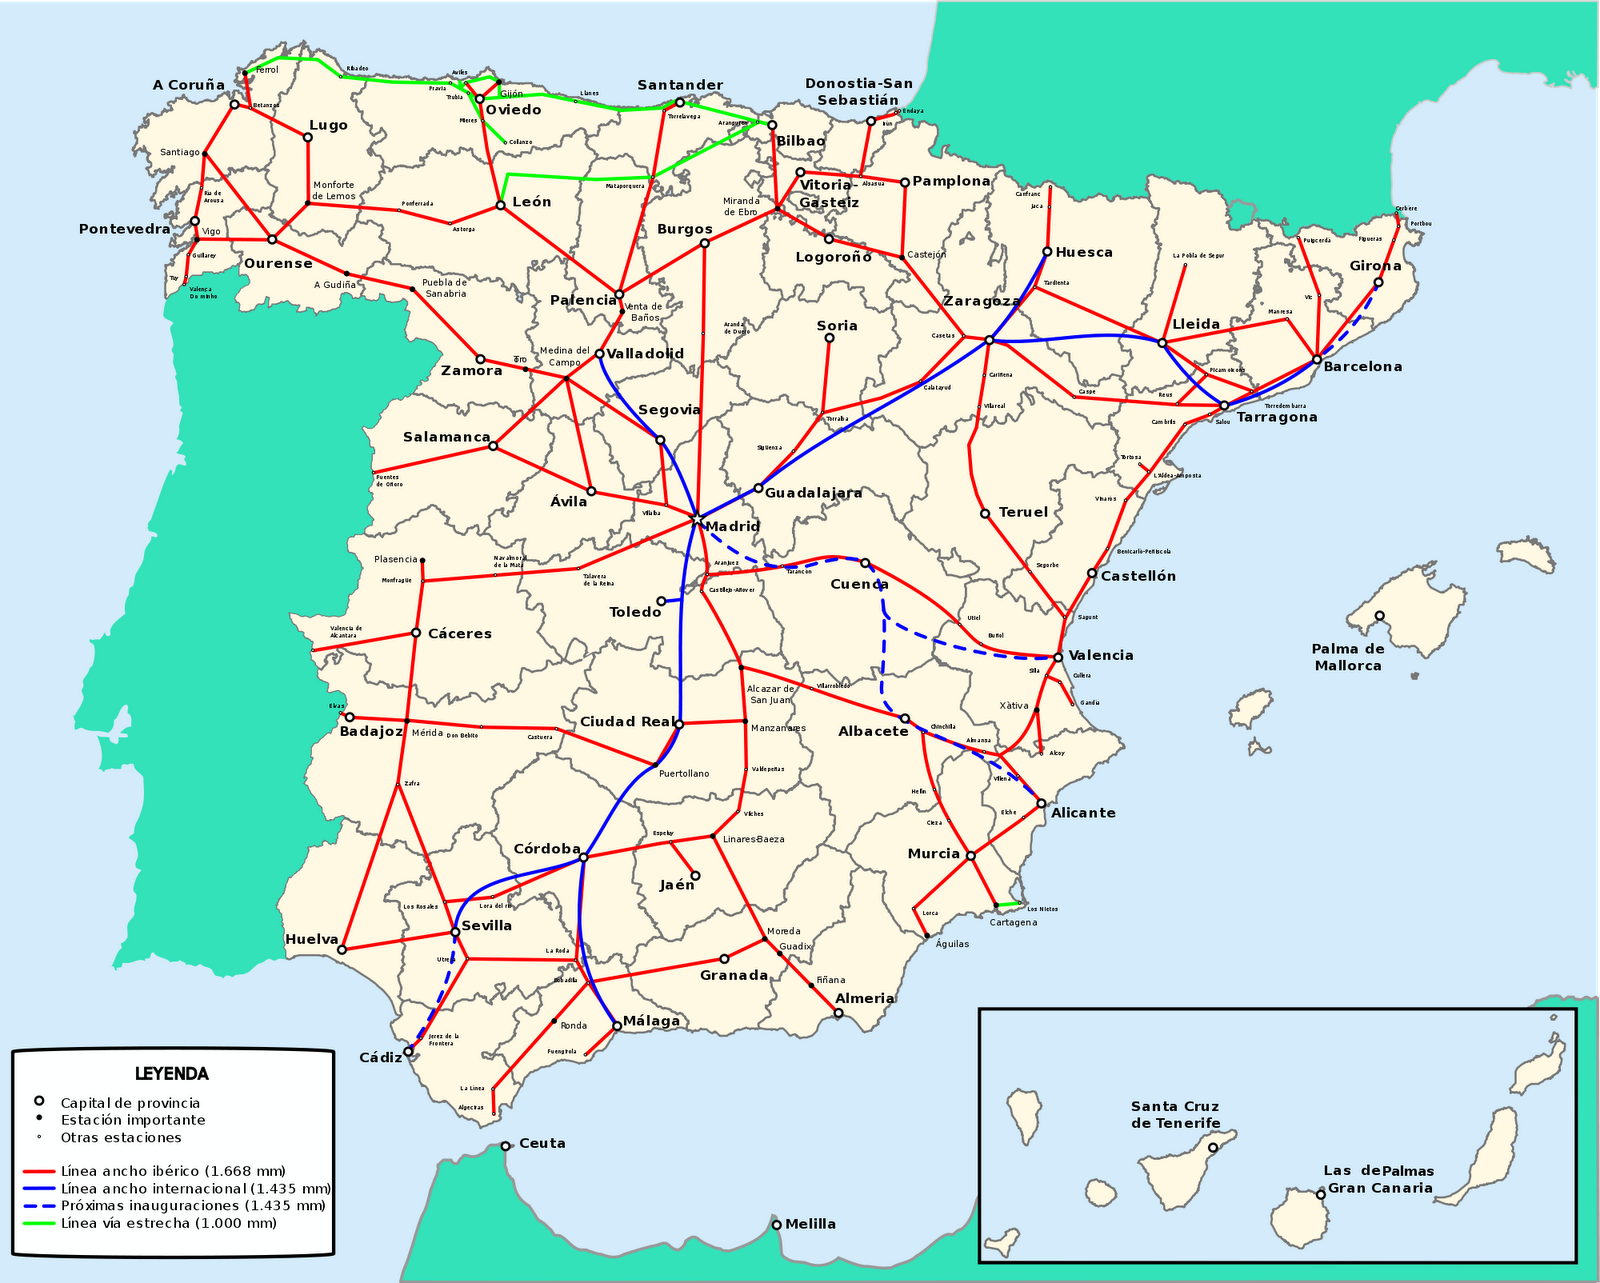 Mapa Tematico De Espana.Red Geografica 2 Mapas Sector Terciario